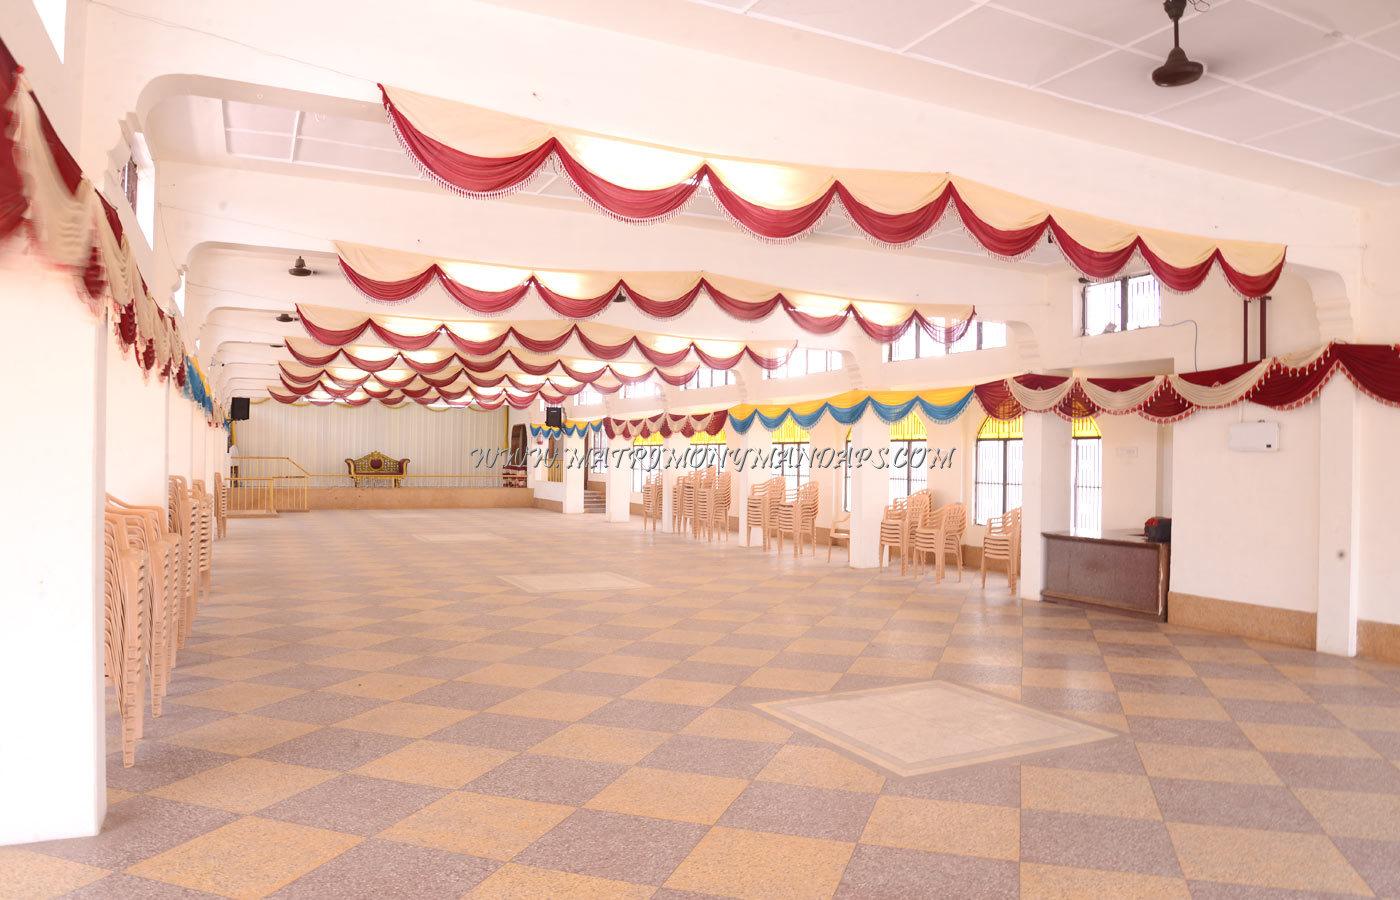 Vasantha Vinothan Hall - Hall